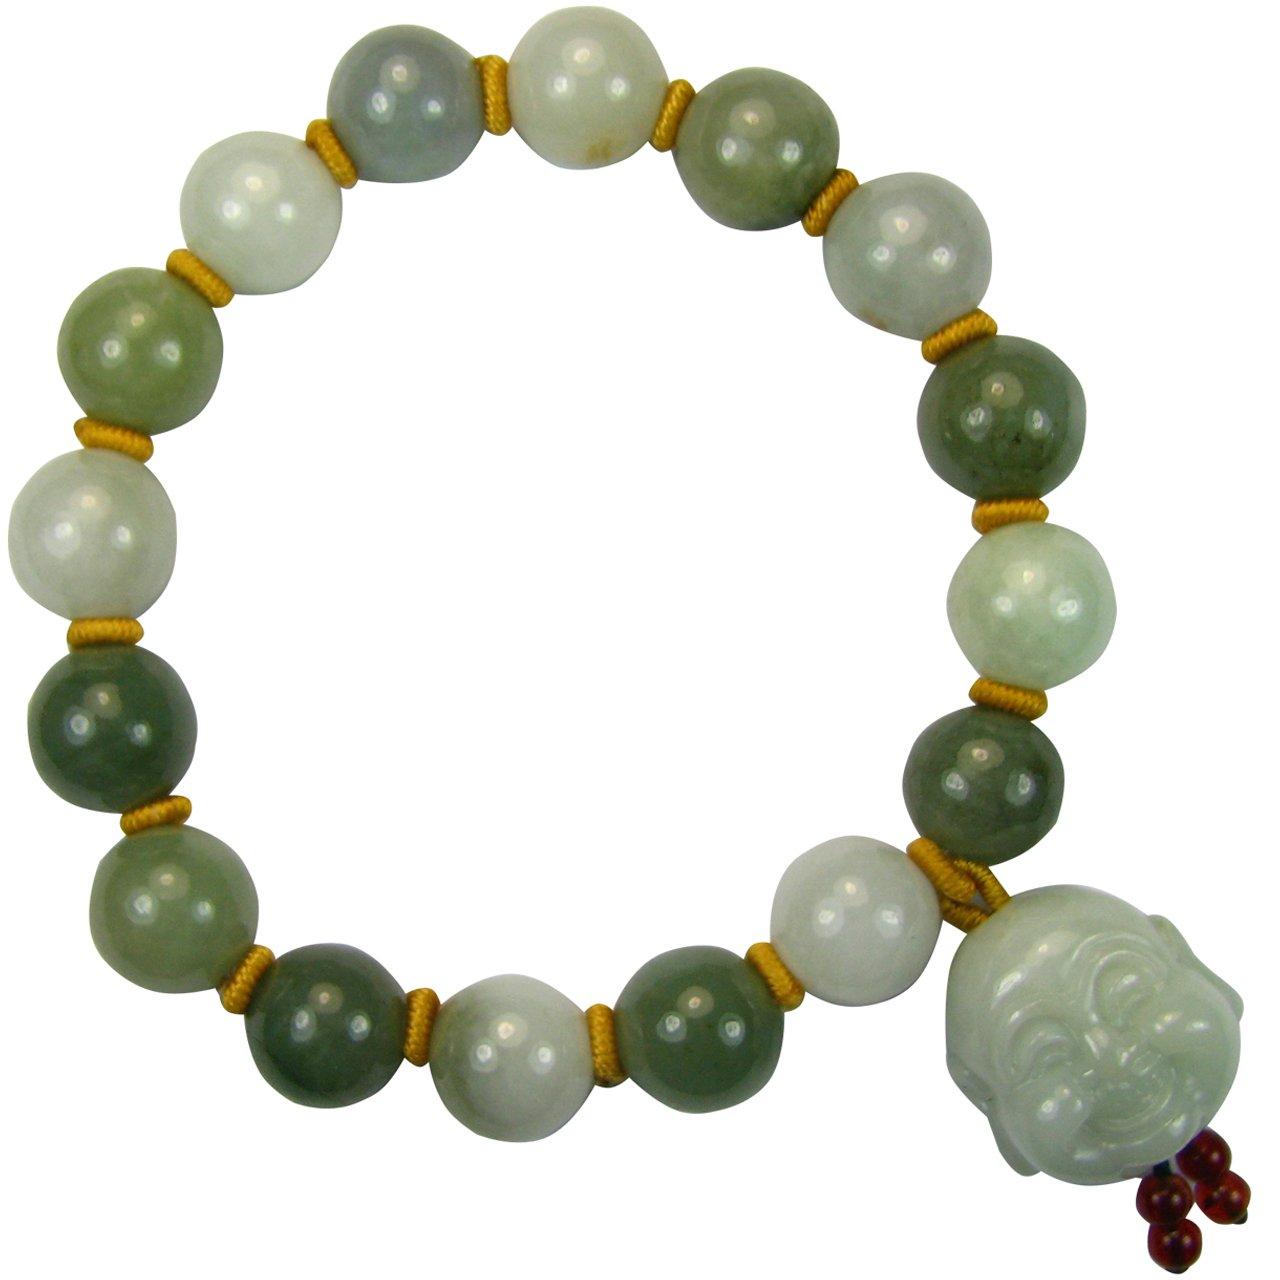 Dahlia Laughing Buddha Jade 12mm Bead Bracelet Genuine Certified Grade A Jadeite, 8''